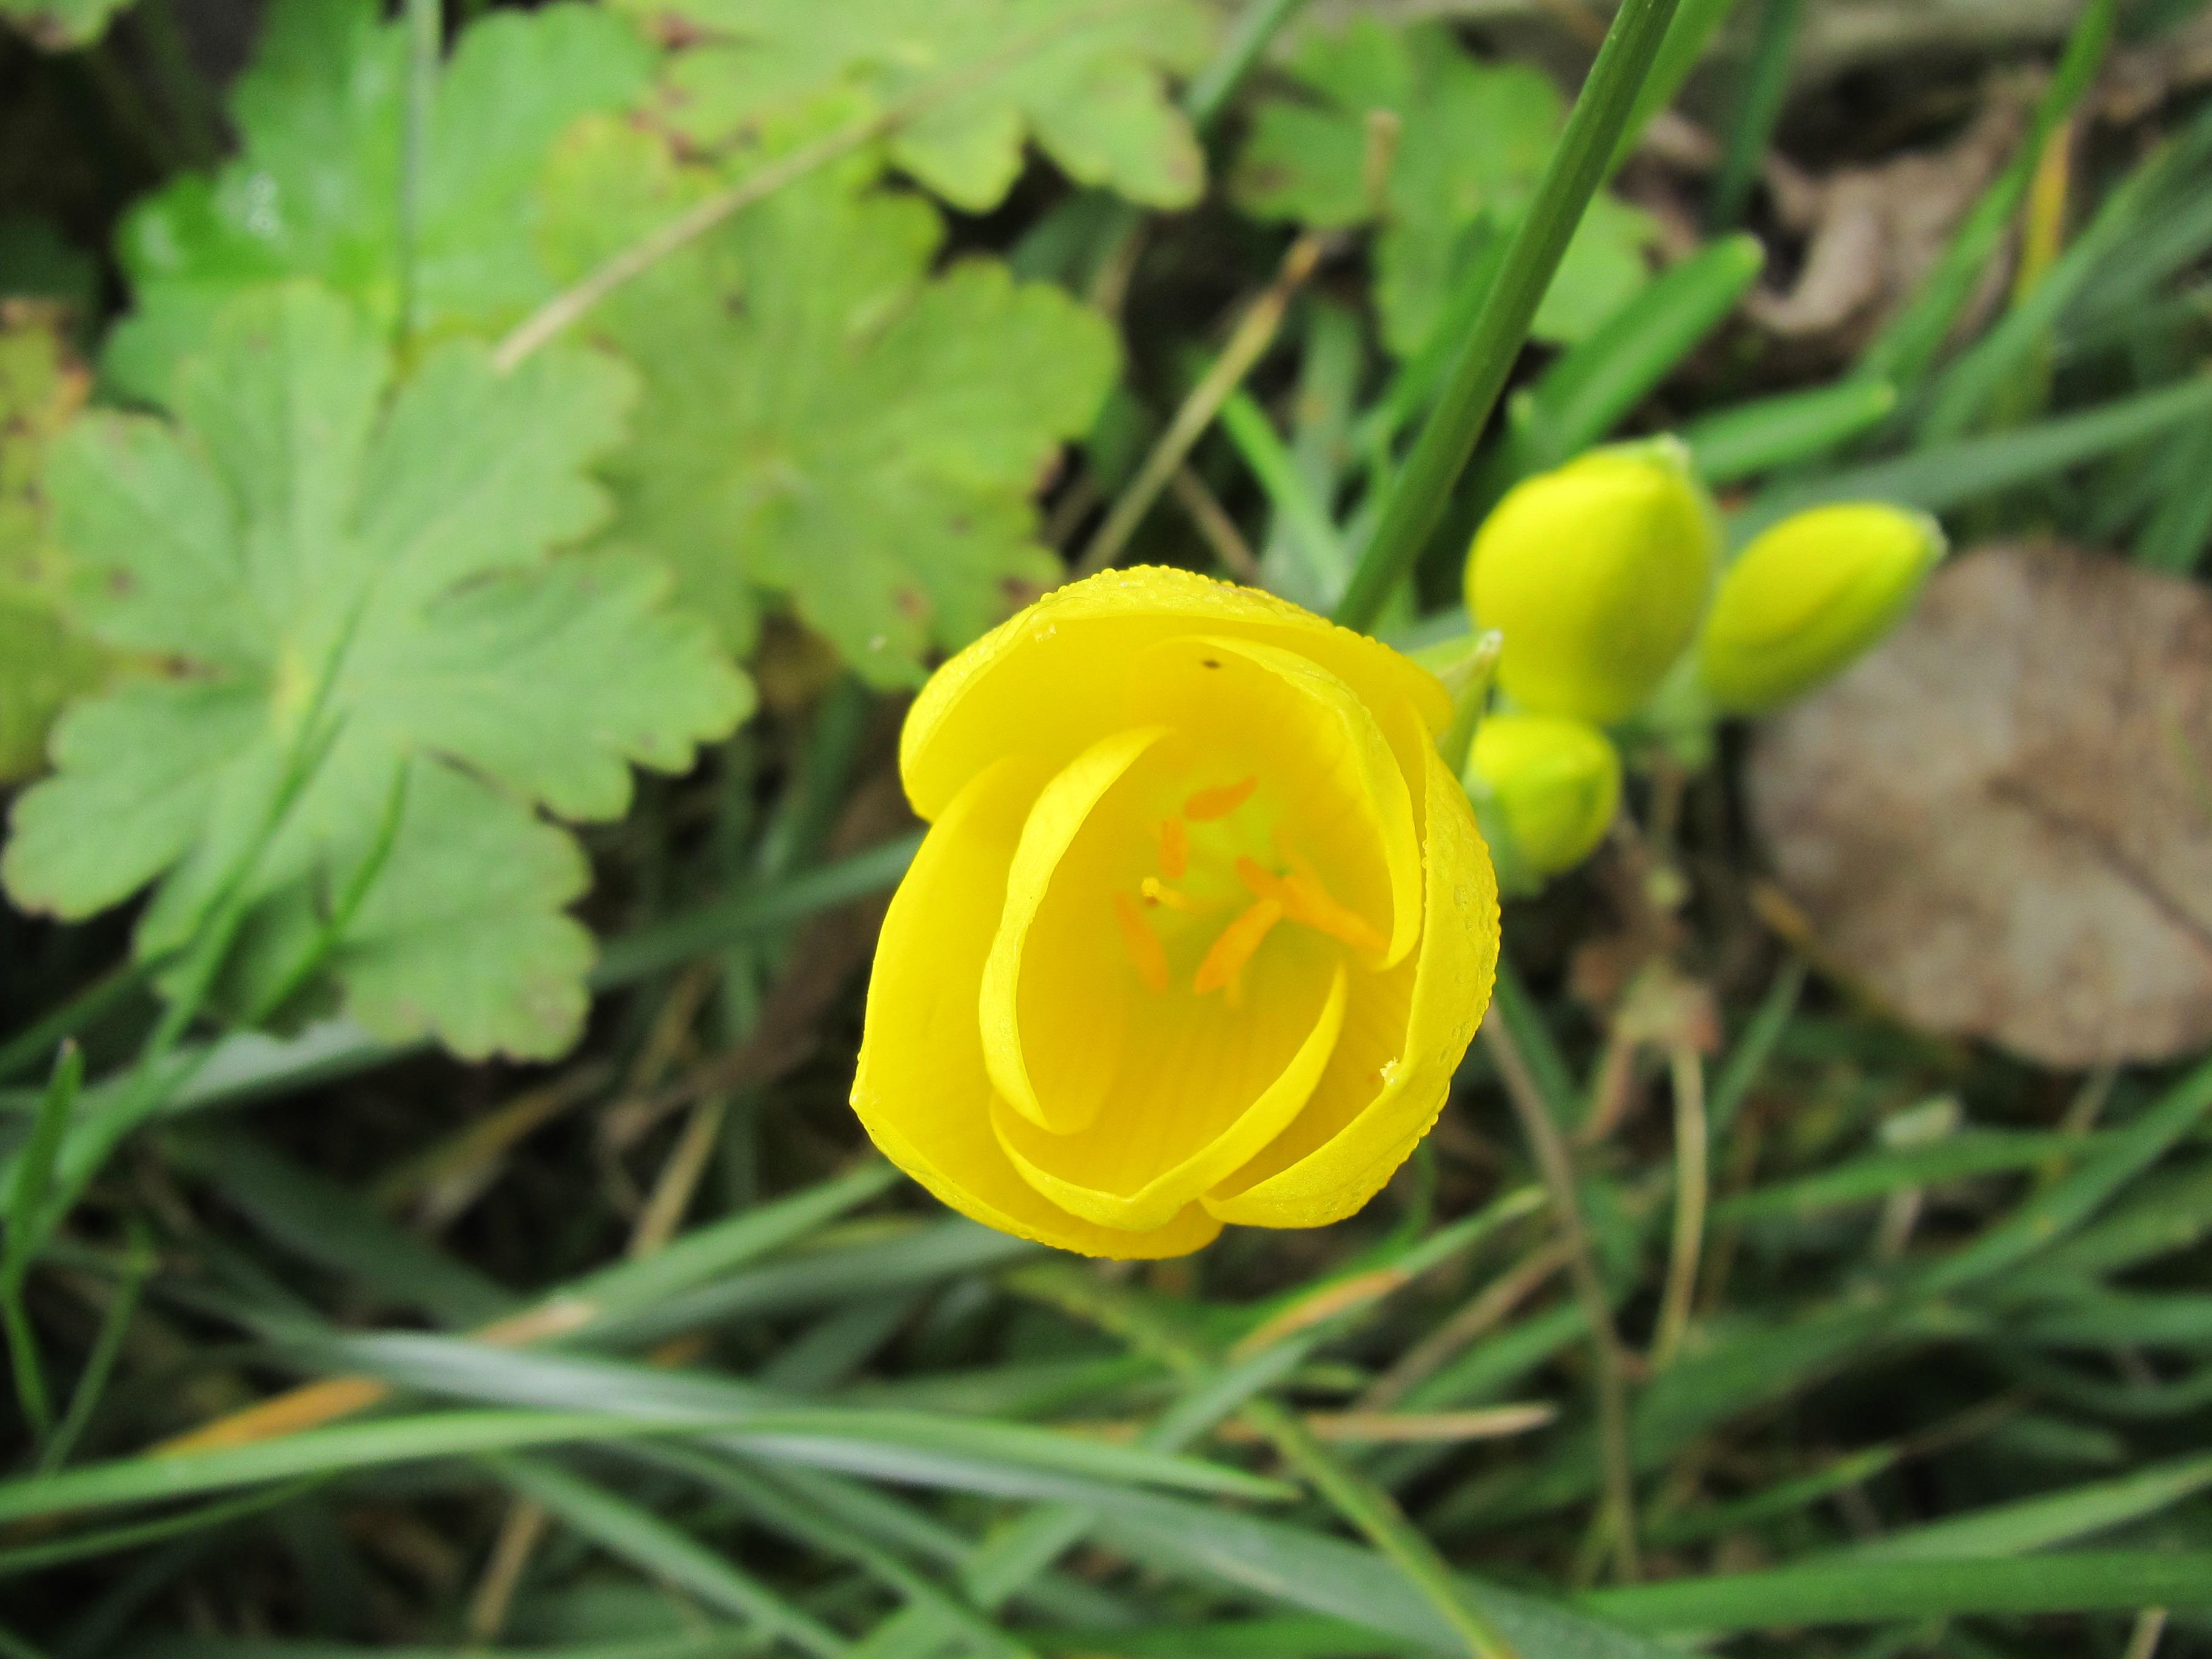 Free photo yellow crocus flower spring yellow nature free yellow crocus flower spring yellow nature garden hq photo mightylinksfo